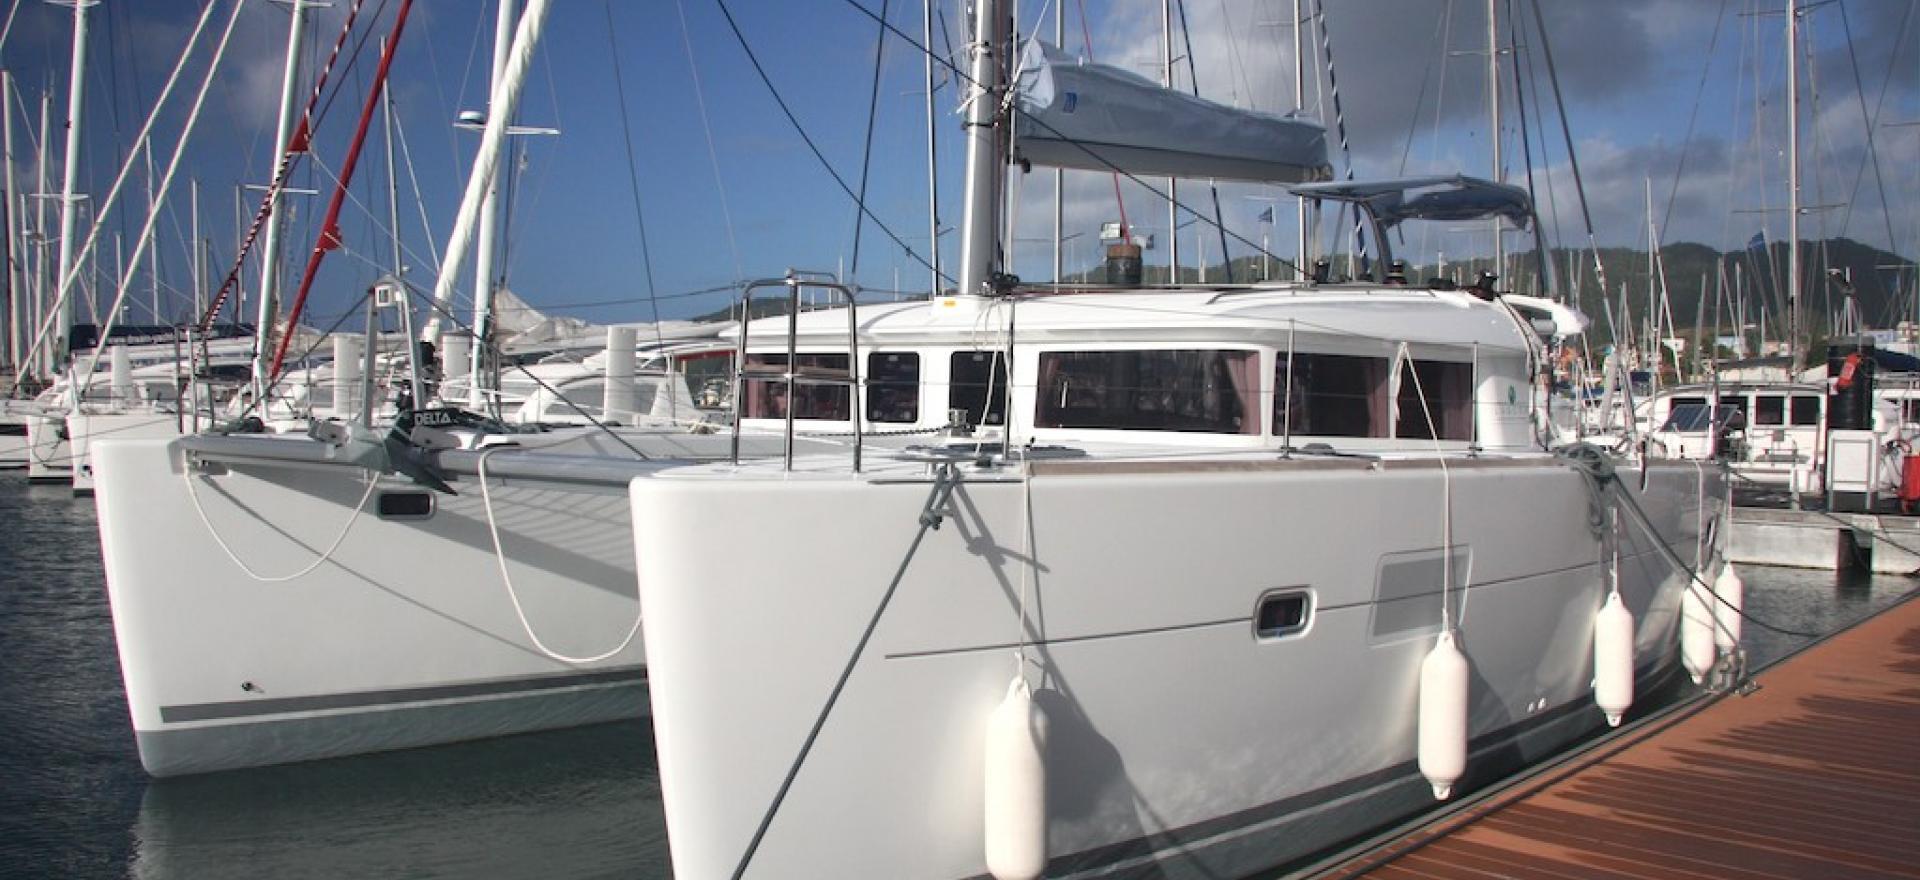 Lagoon 400 au ponton en Martinique